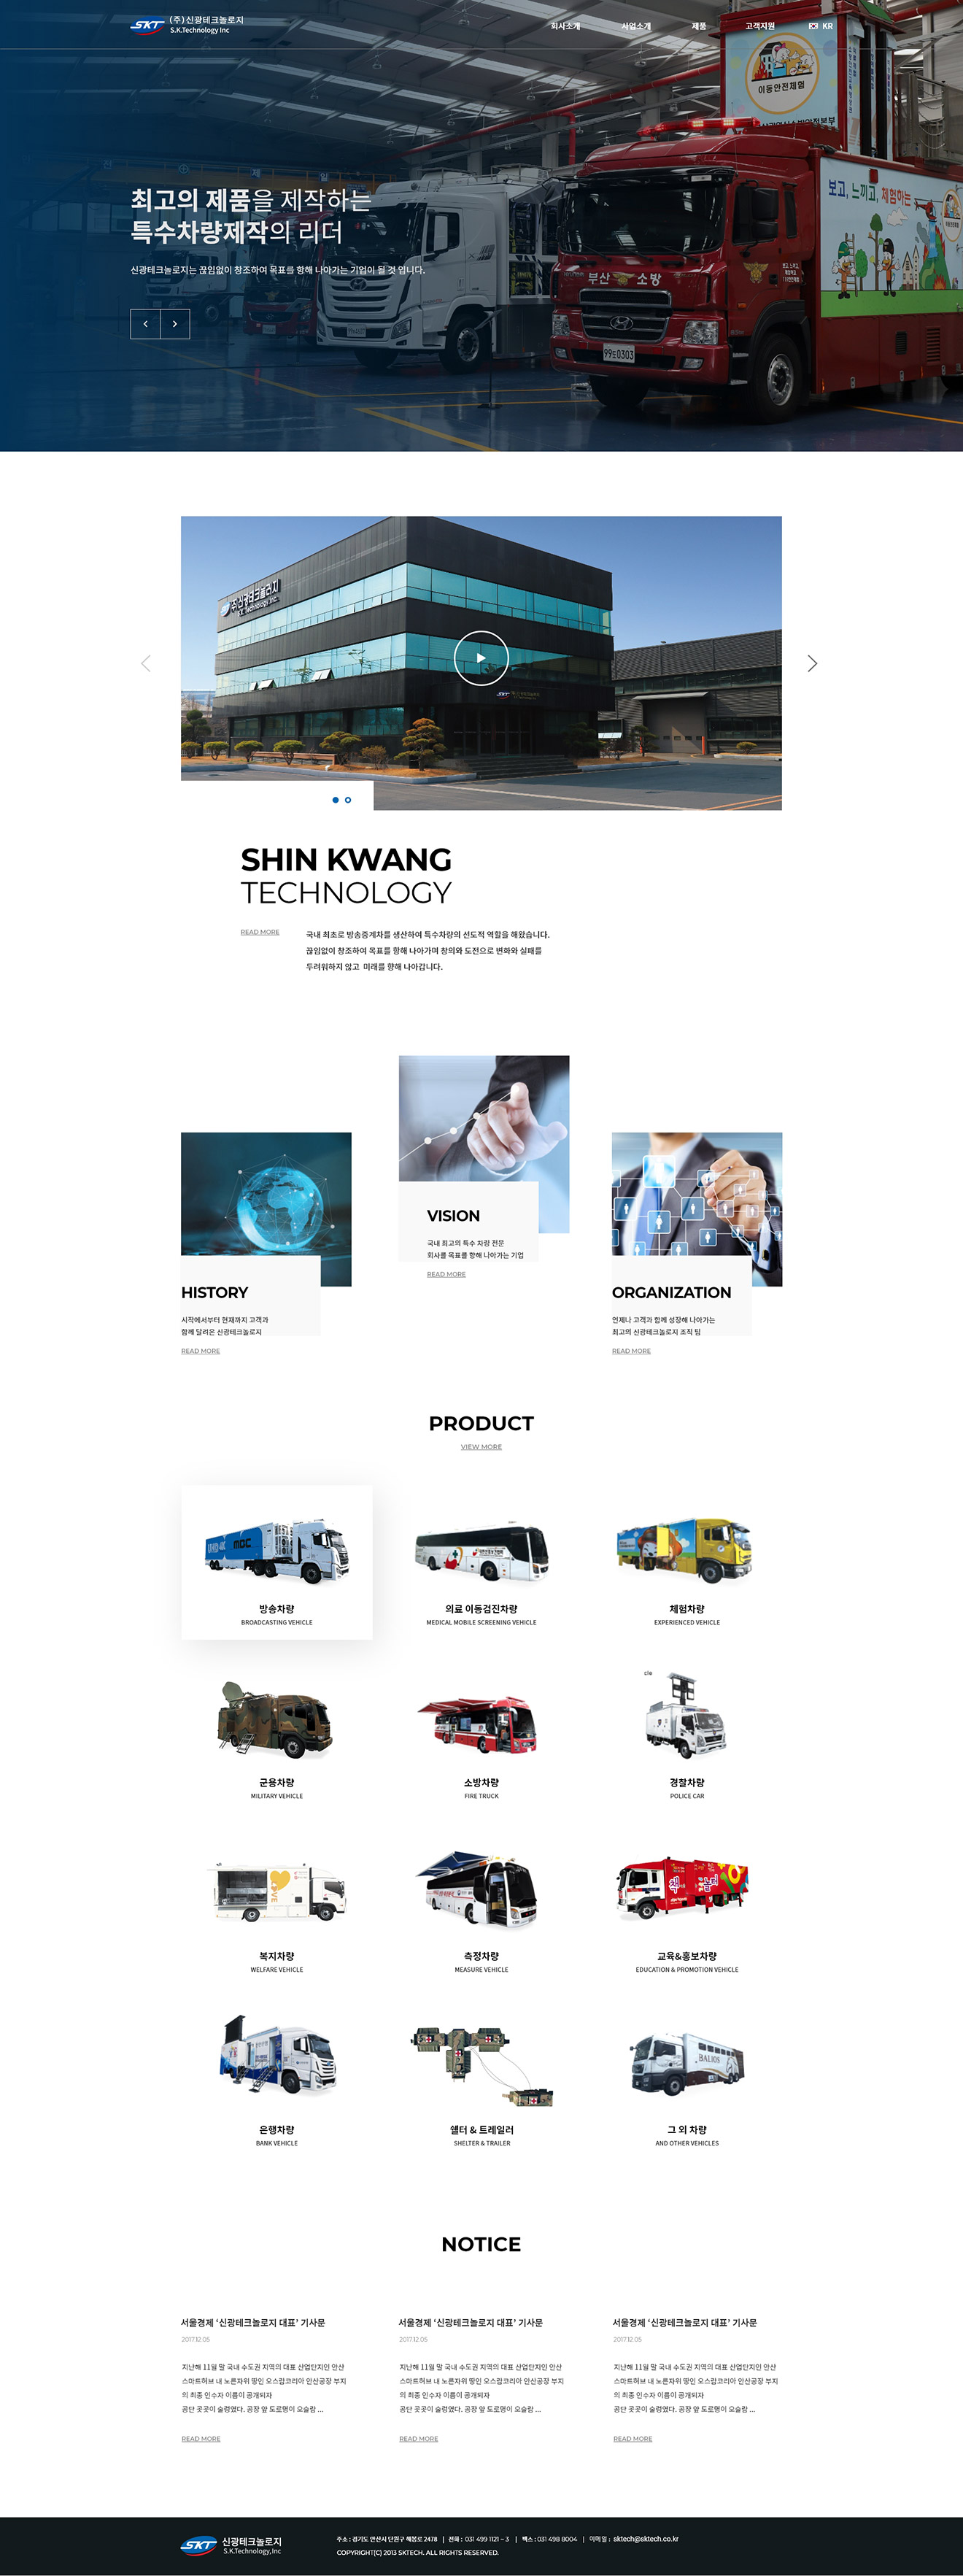 shinkwang